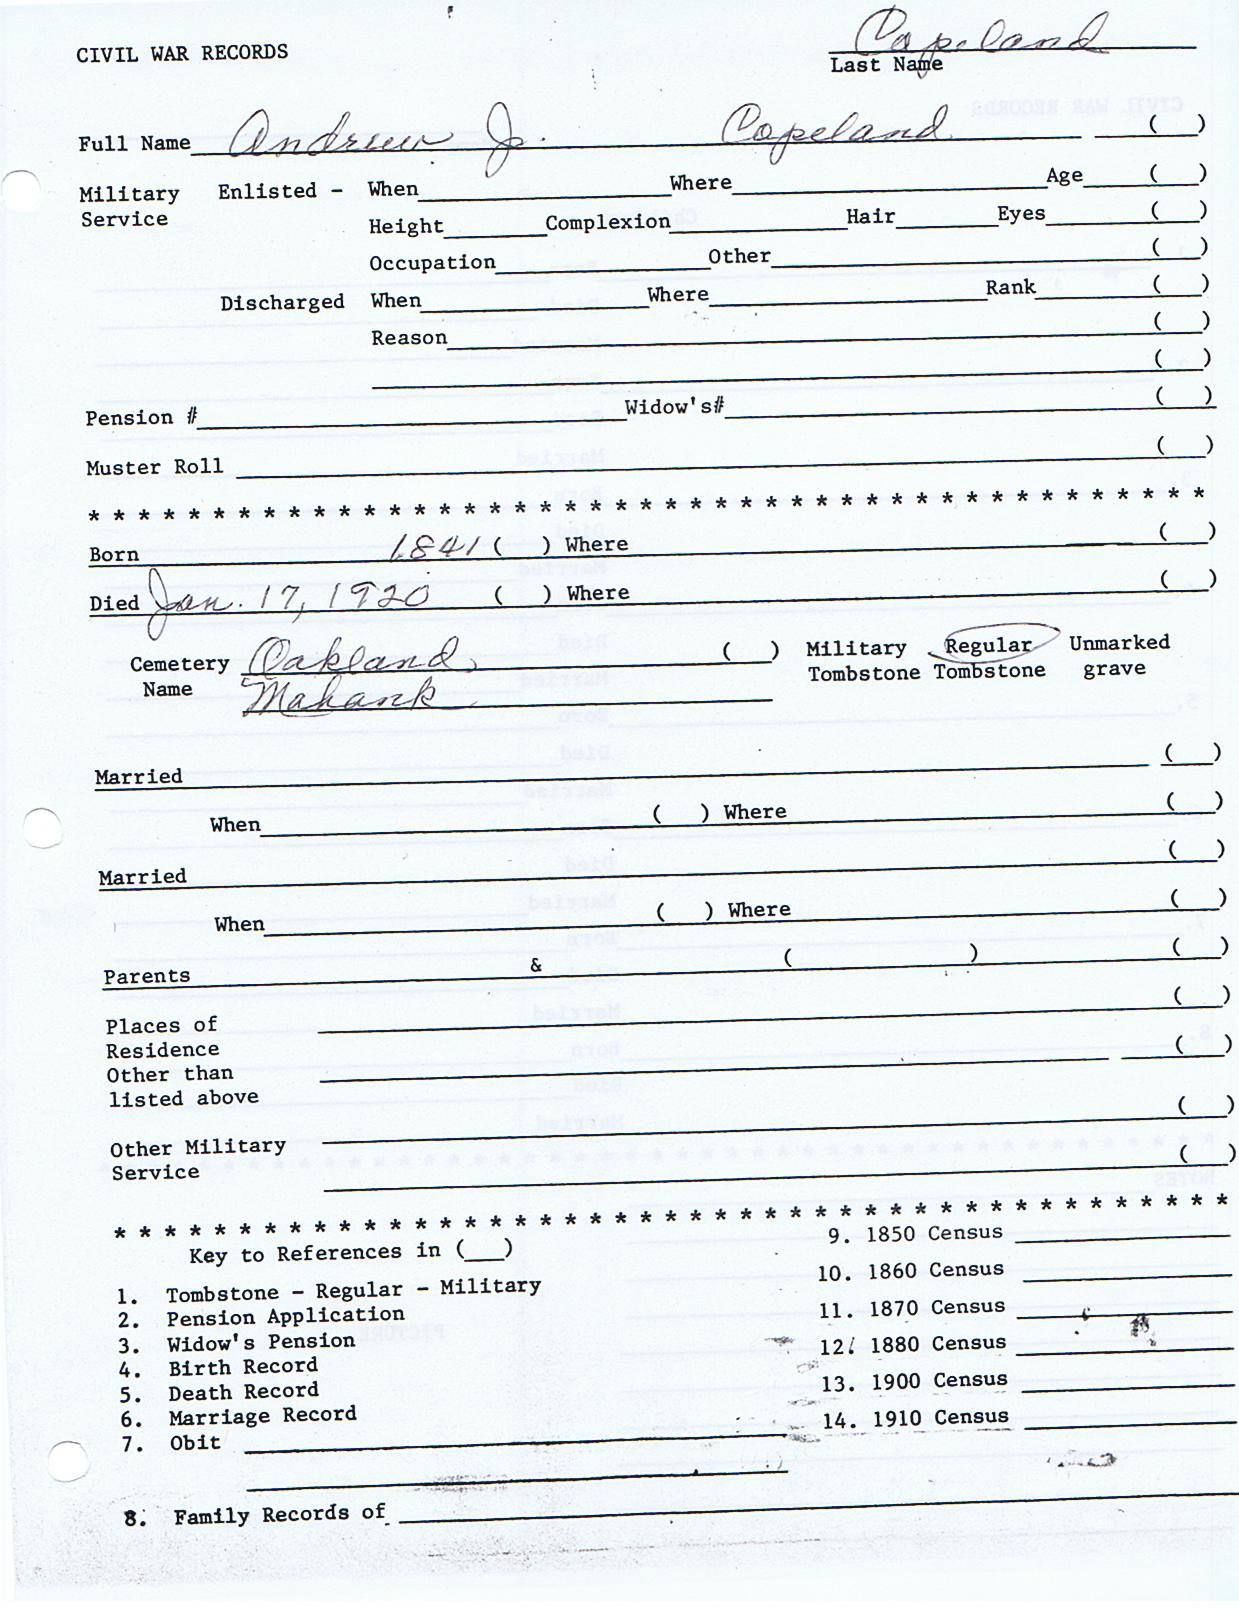 copeland-kaufman_civil_war_records-3545